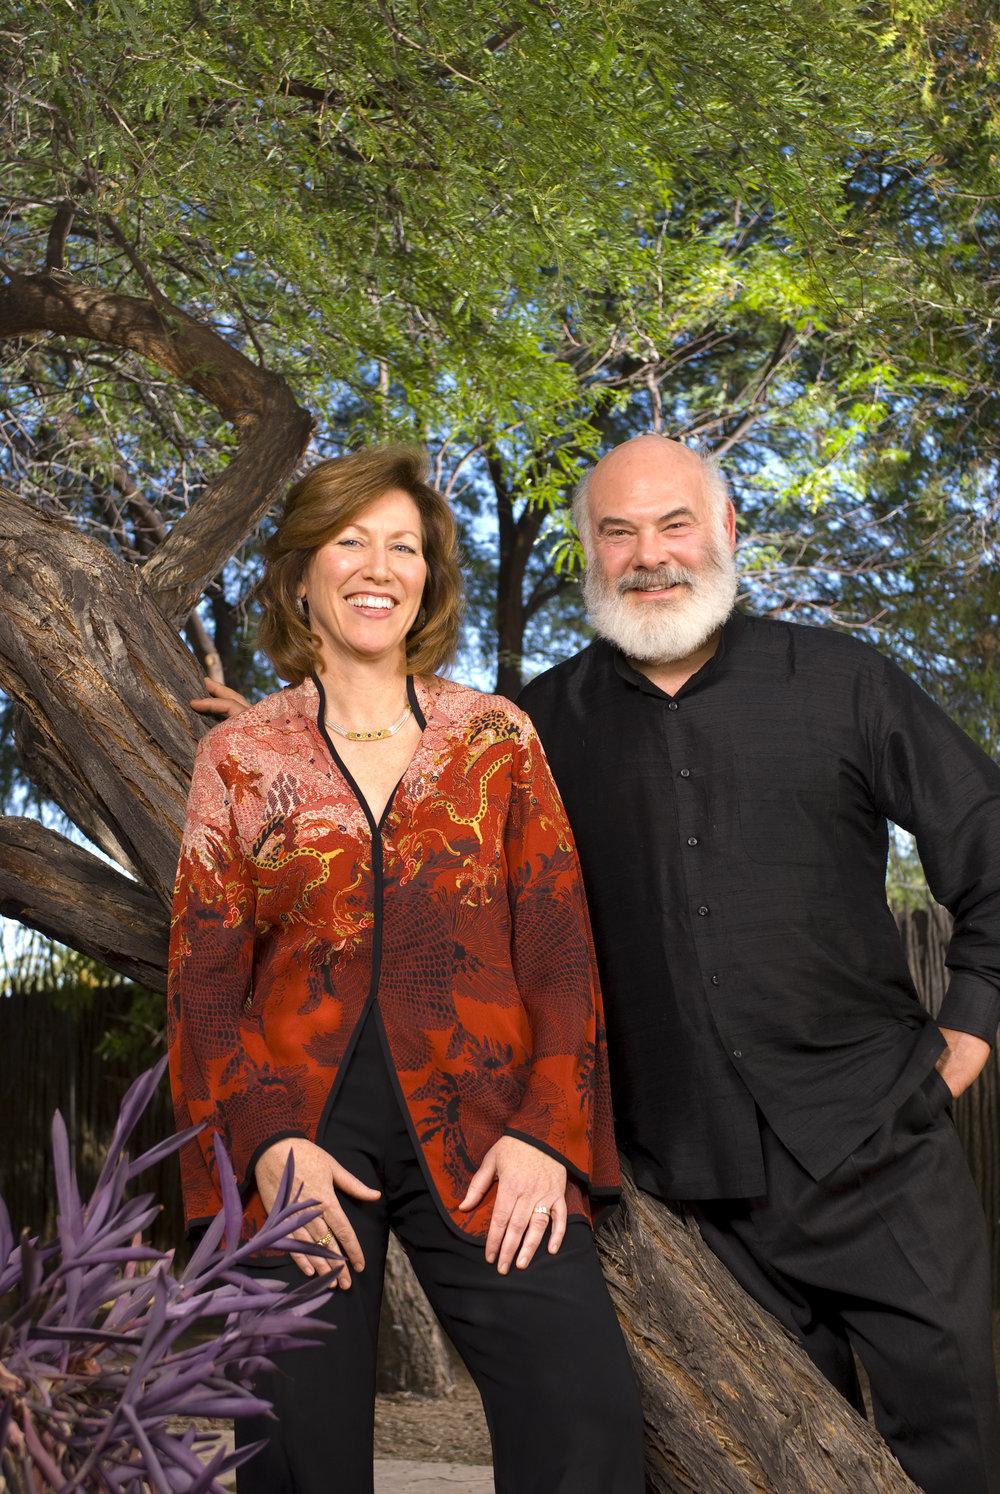 Victoria Maizes:  Executive Director, University of Arizona Center for Integrative Medicine  Andrew Weil:  Founder, the University of Arizona Center for Integrative Medicine